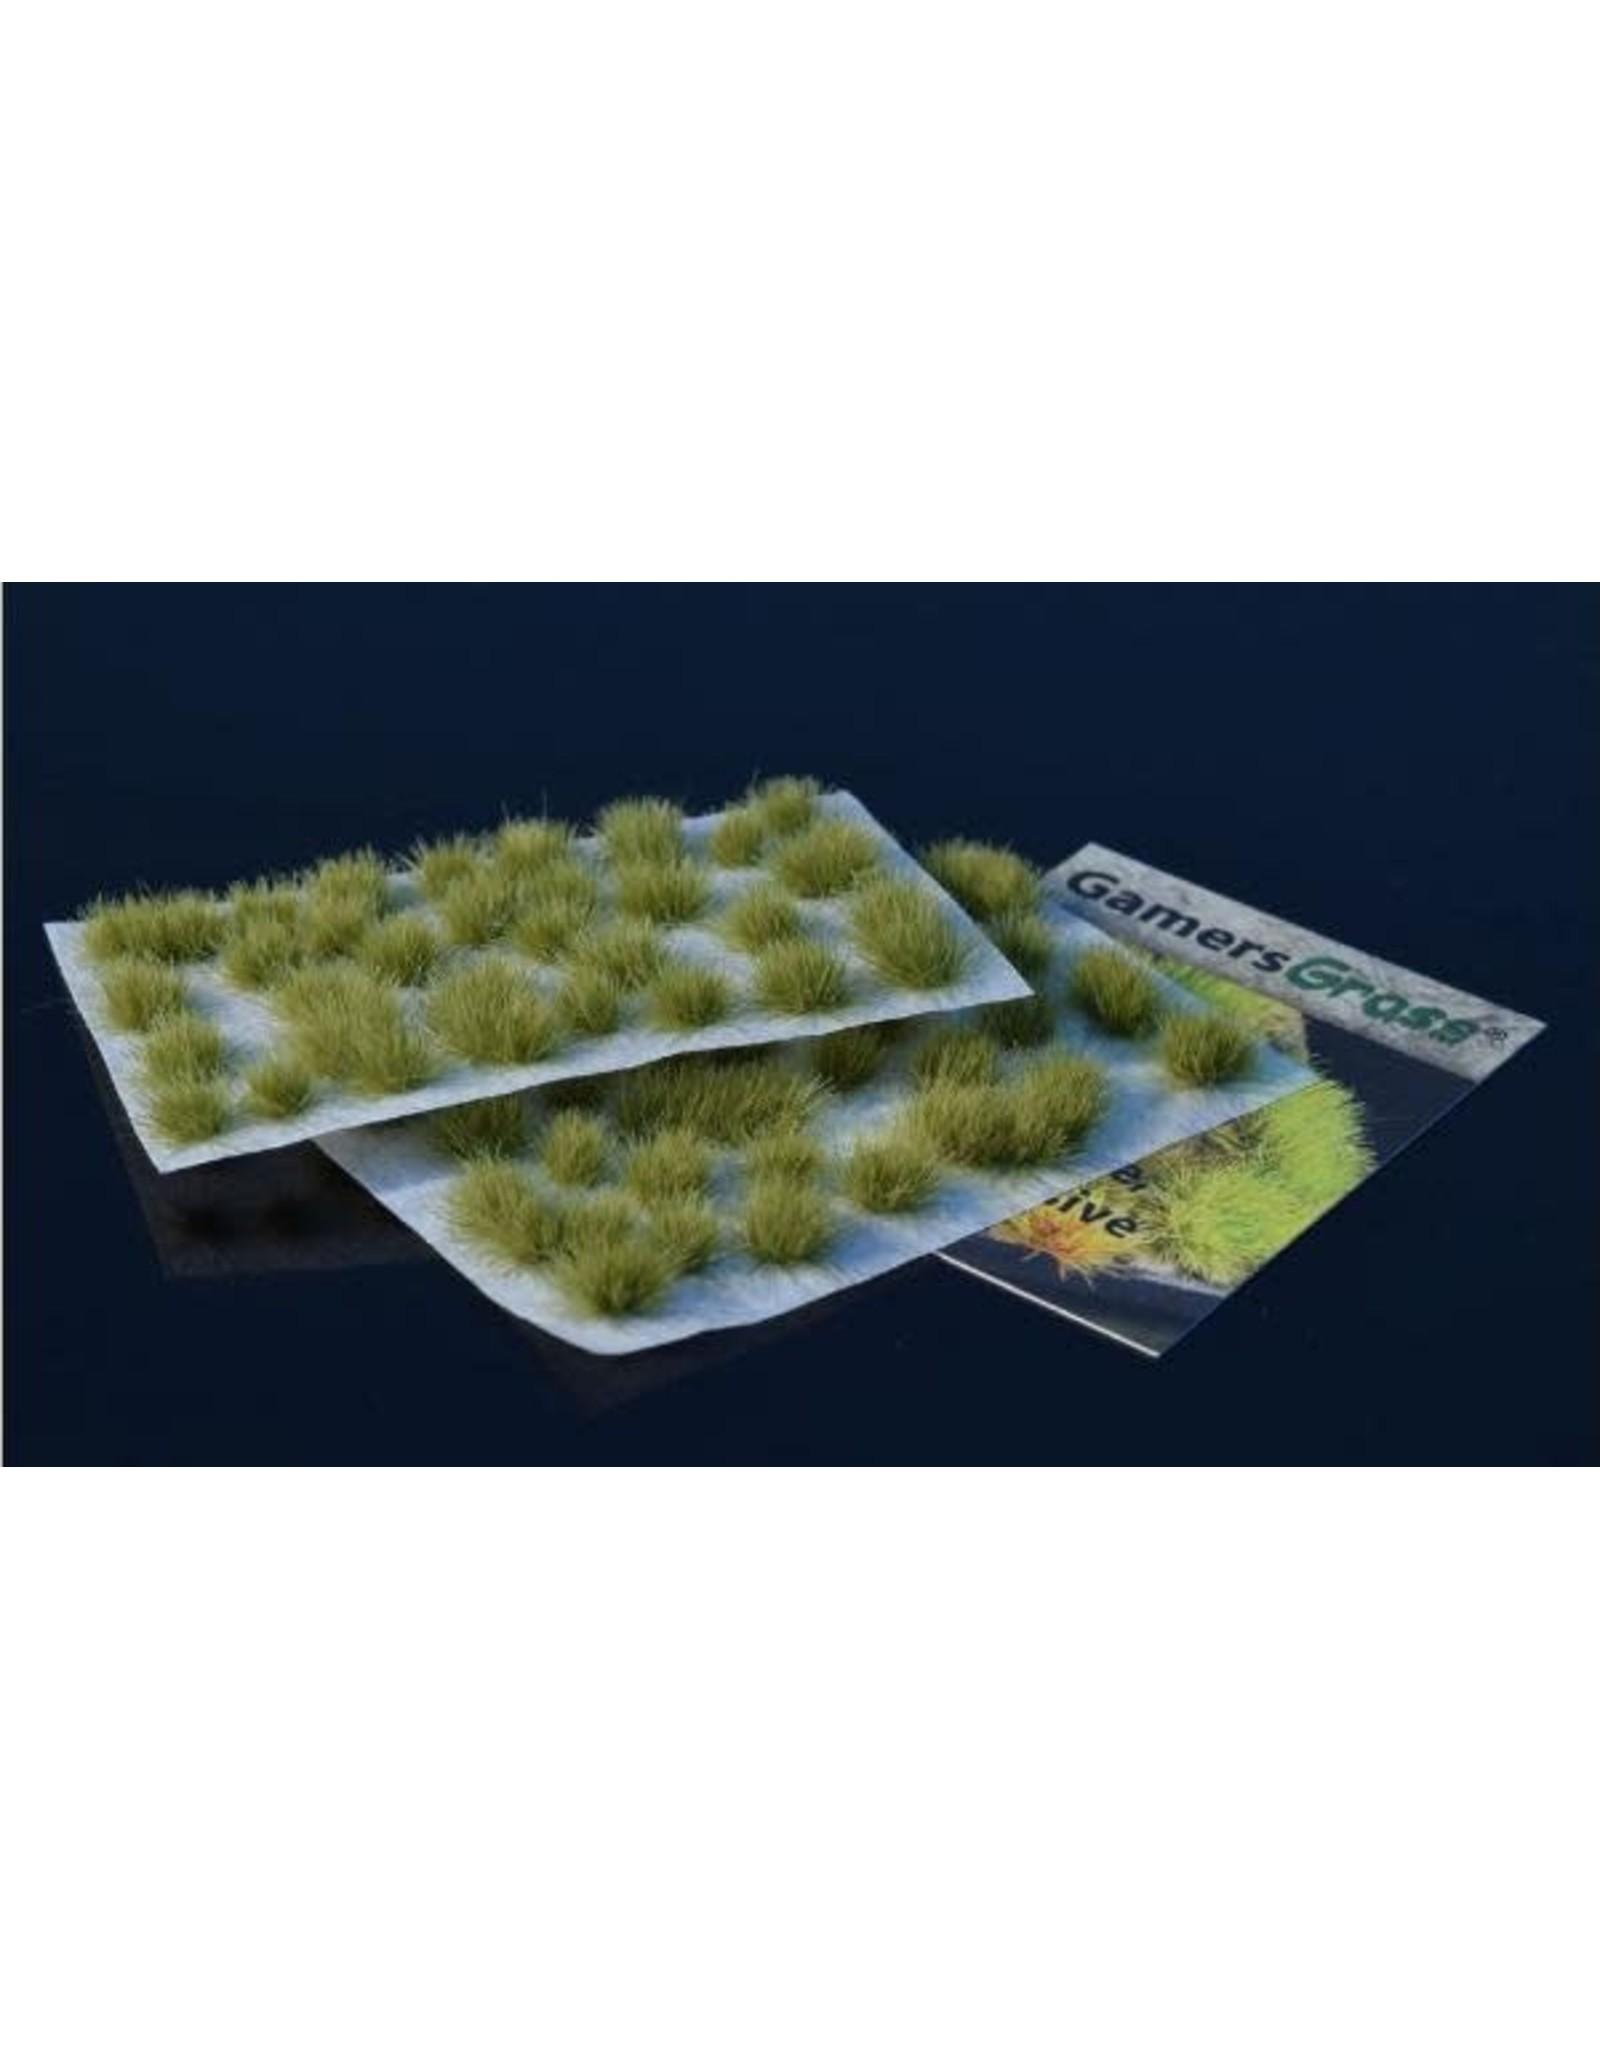 Gamer Grass Gamers Grass Dry Green Wild Tufts 6mm